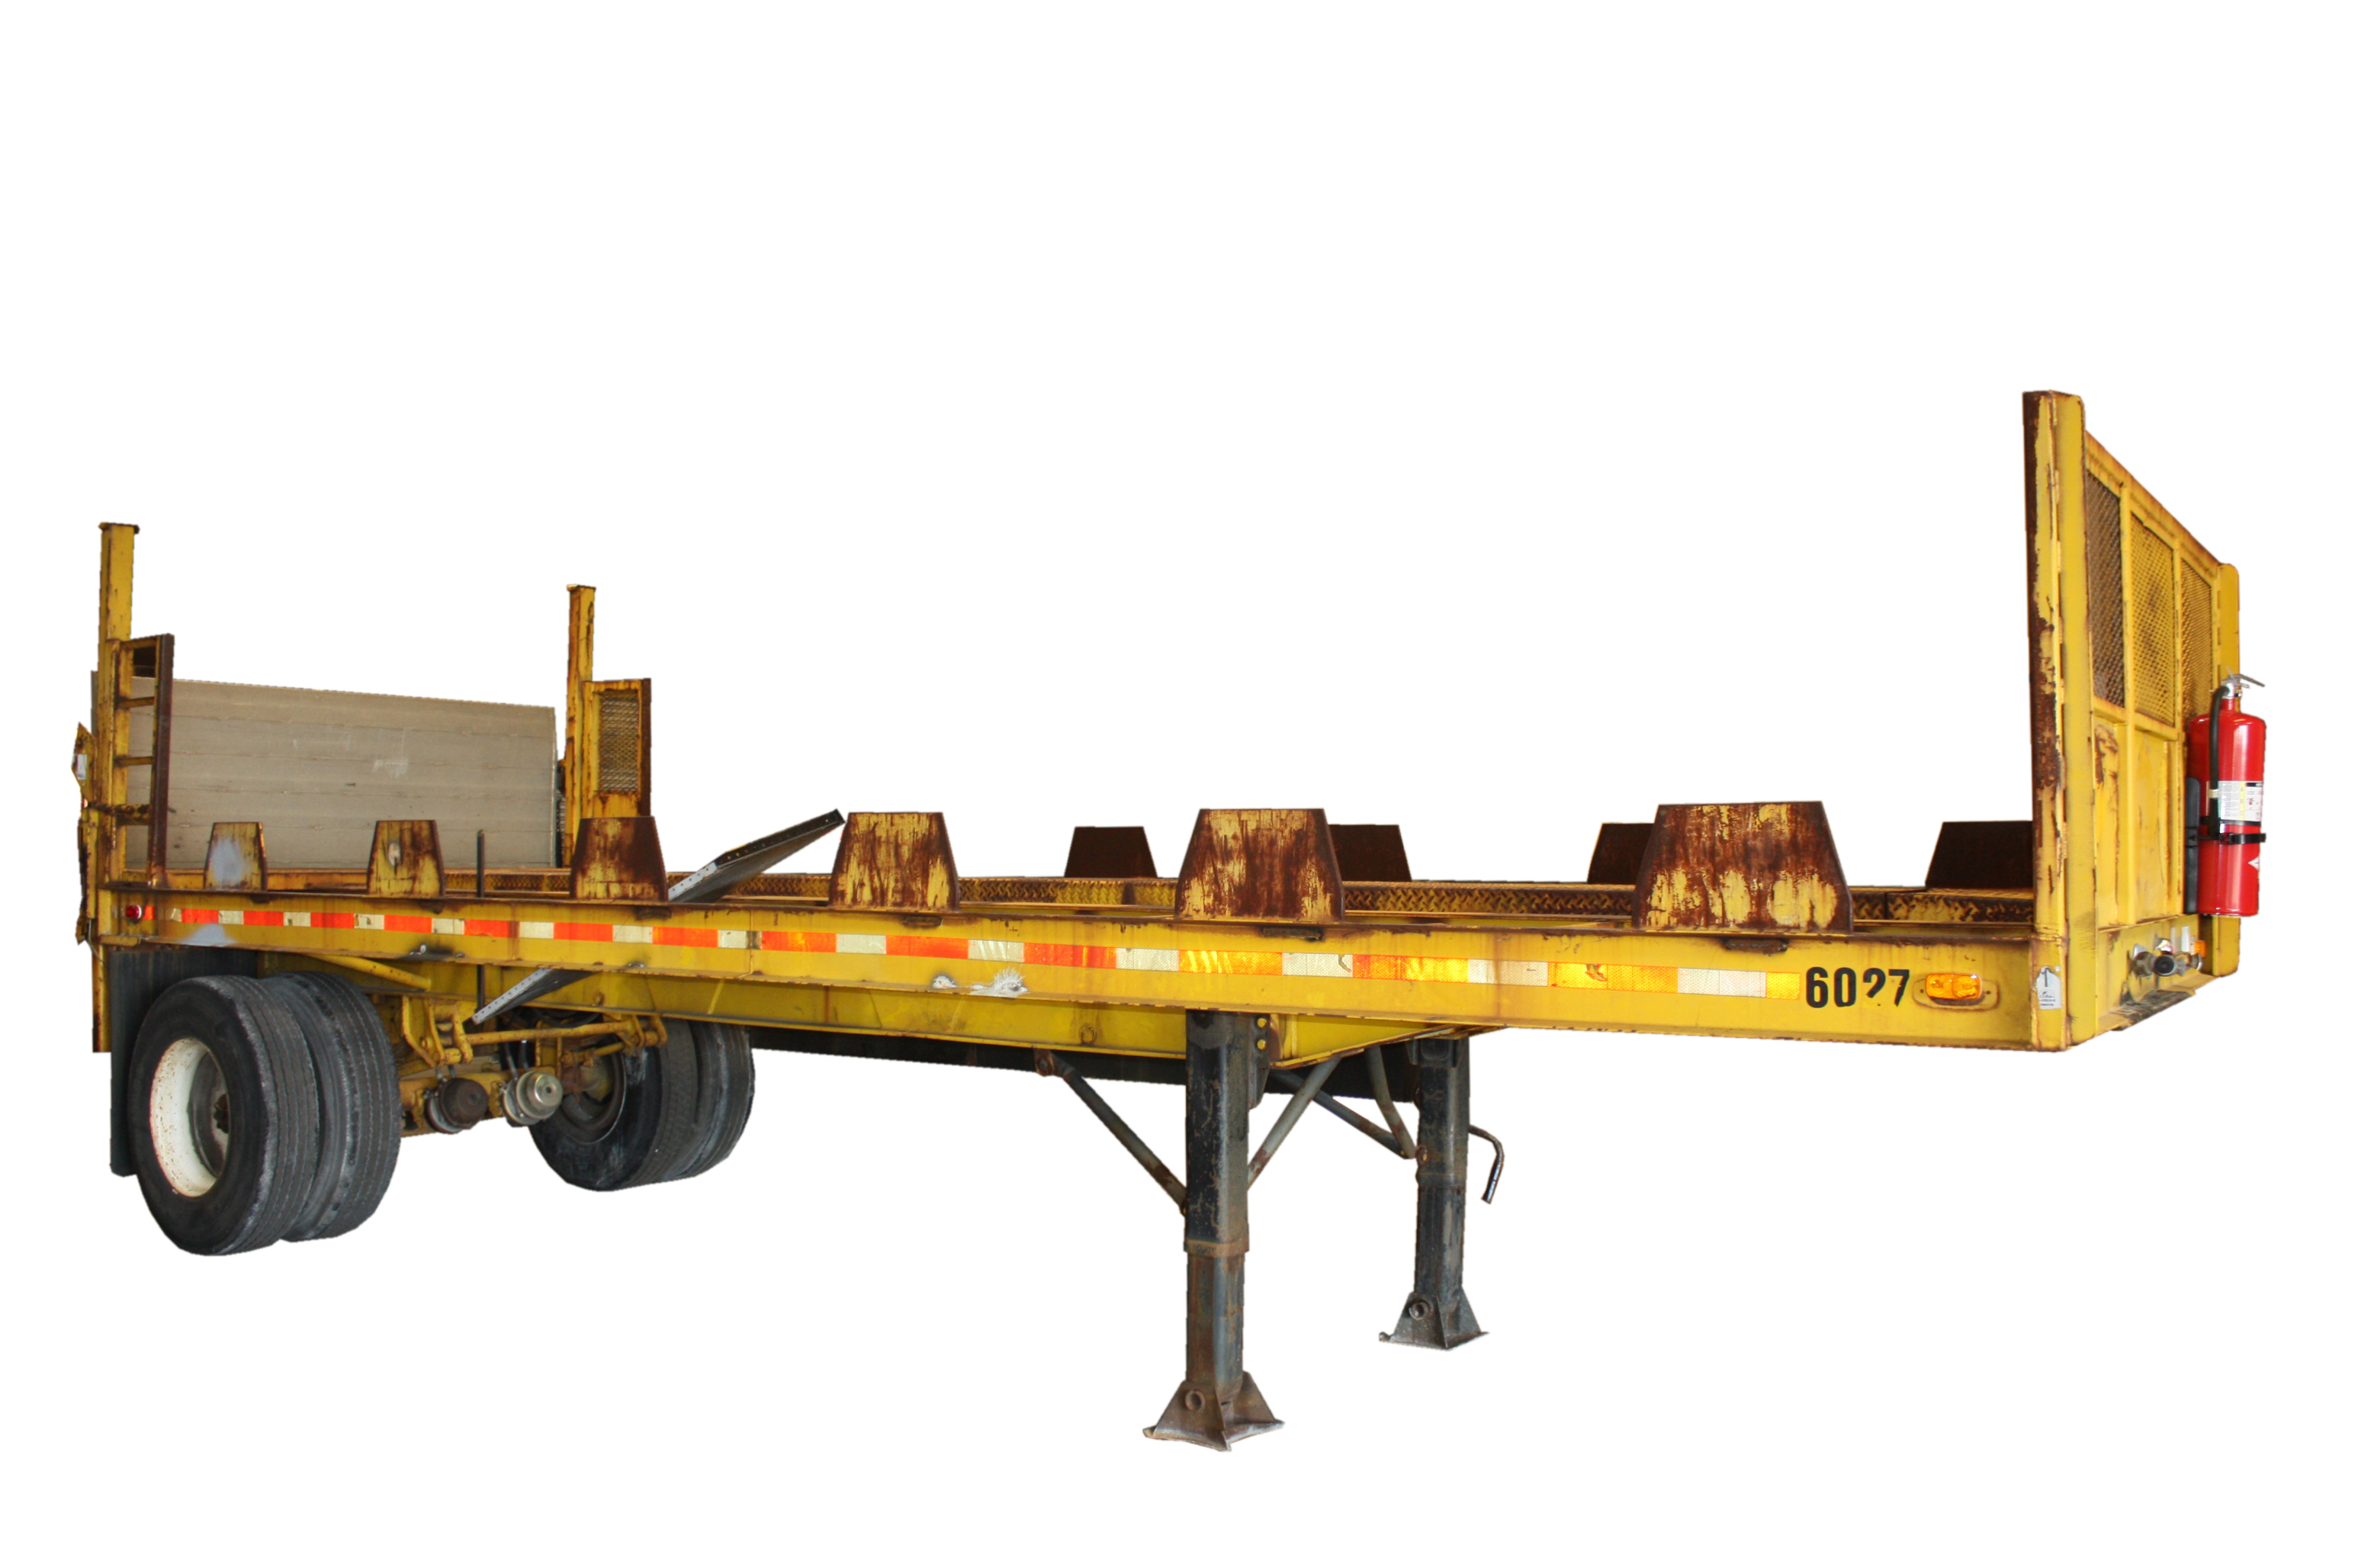 Refurb Truck Cutout